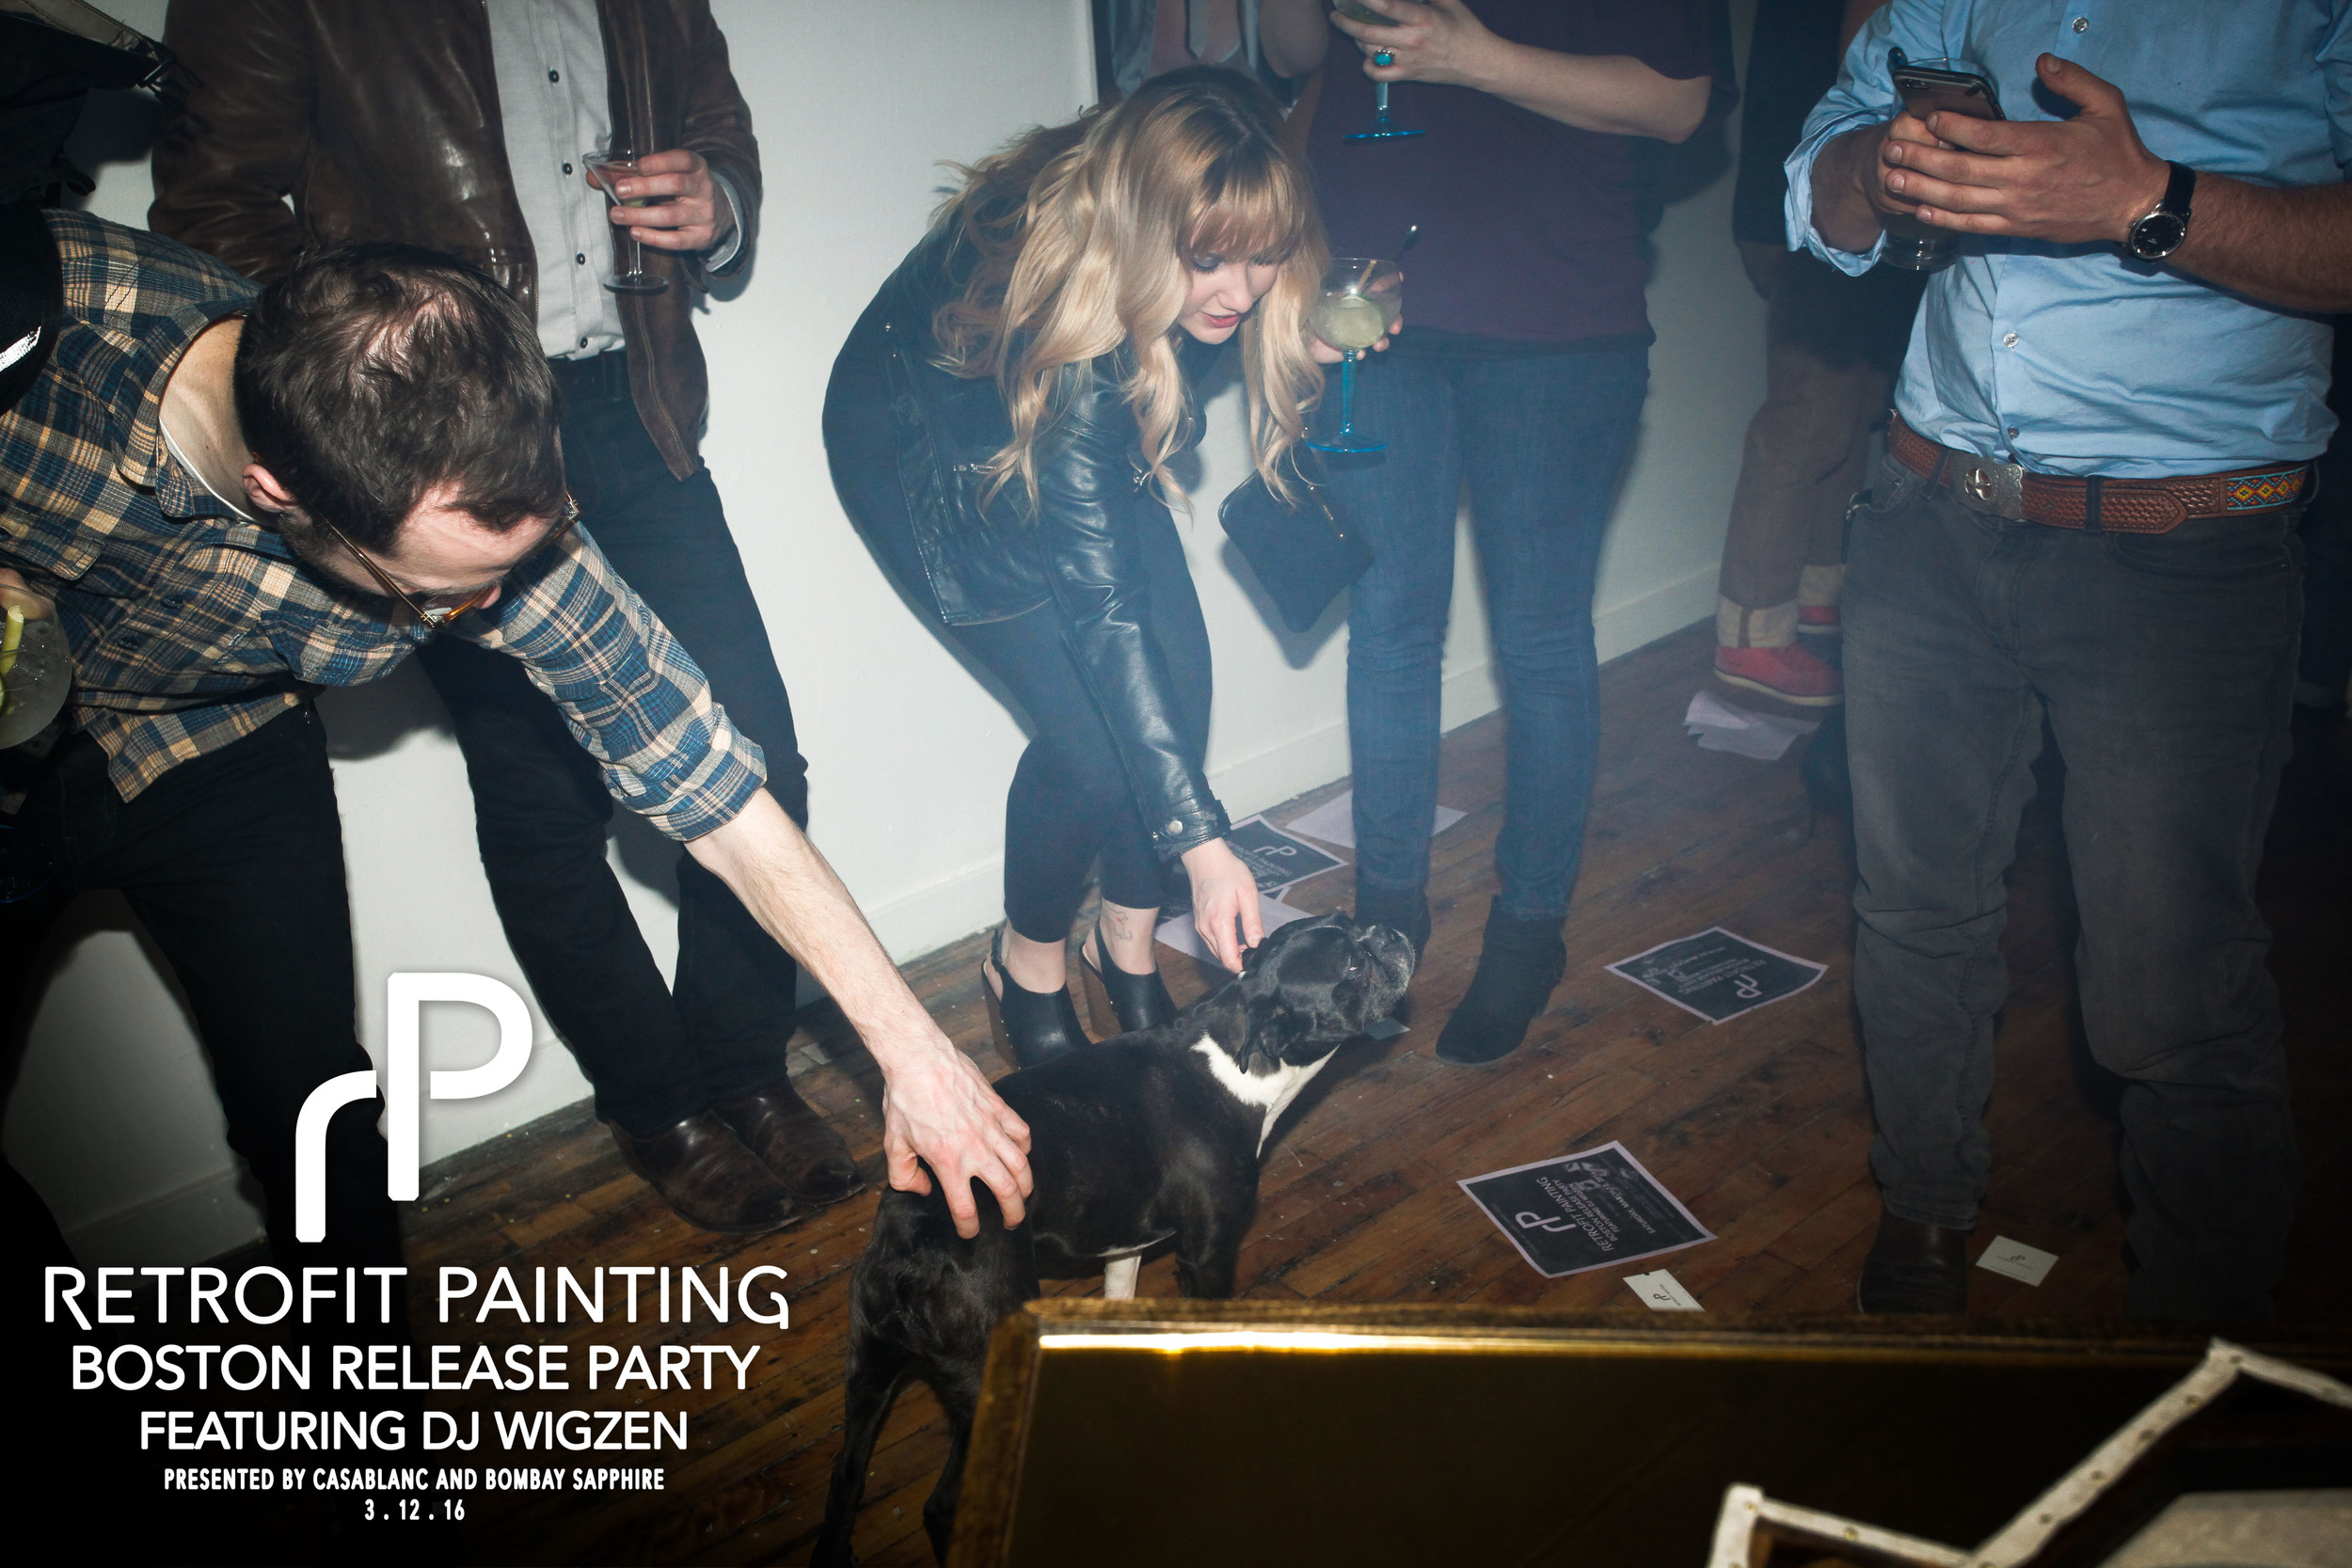 Retrofit Painting Boston Release Party 0024.jpg